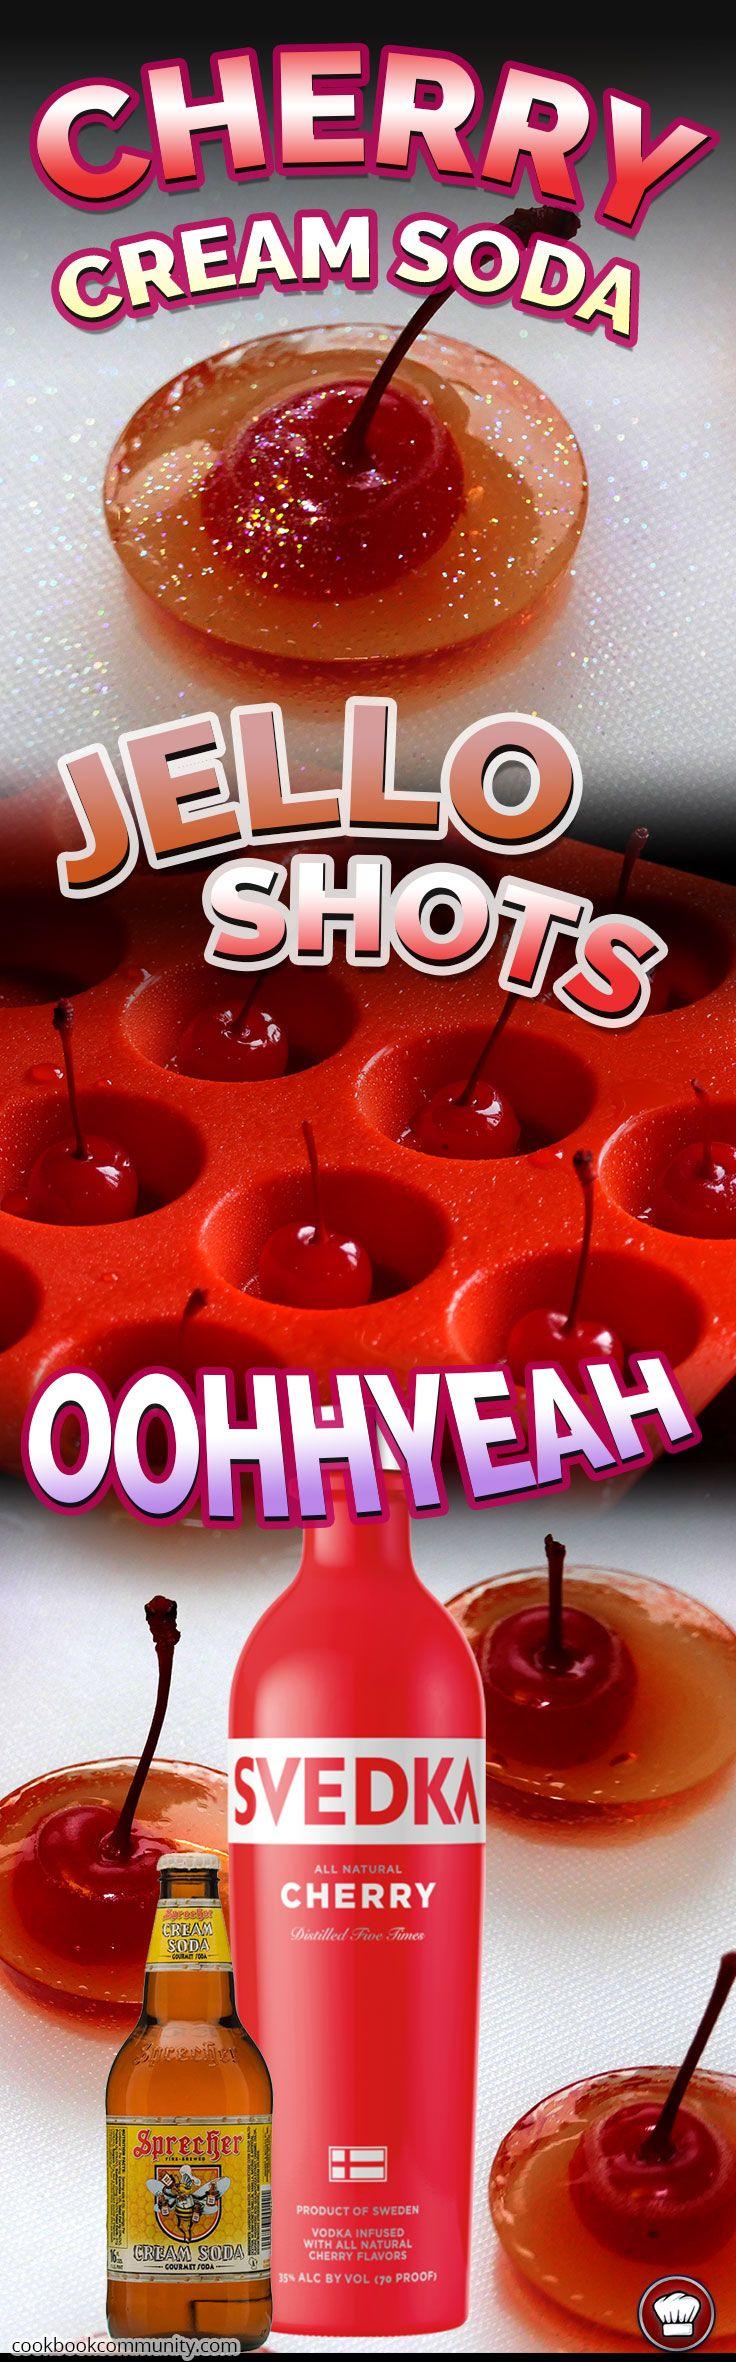 CHERRY VODKA CREAM JELLO SHOTS - Such a lovely creamy cherry flavor!